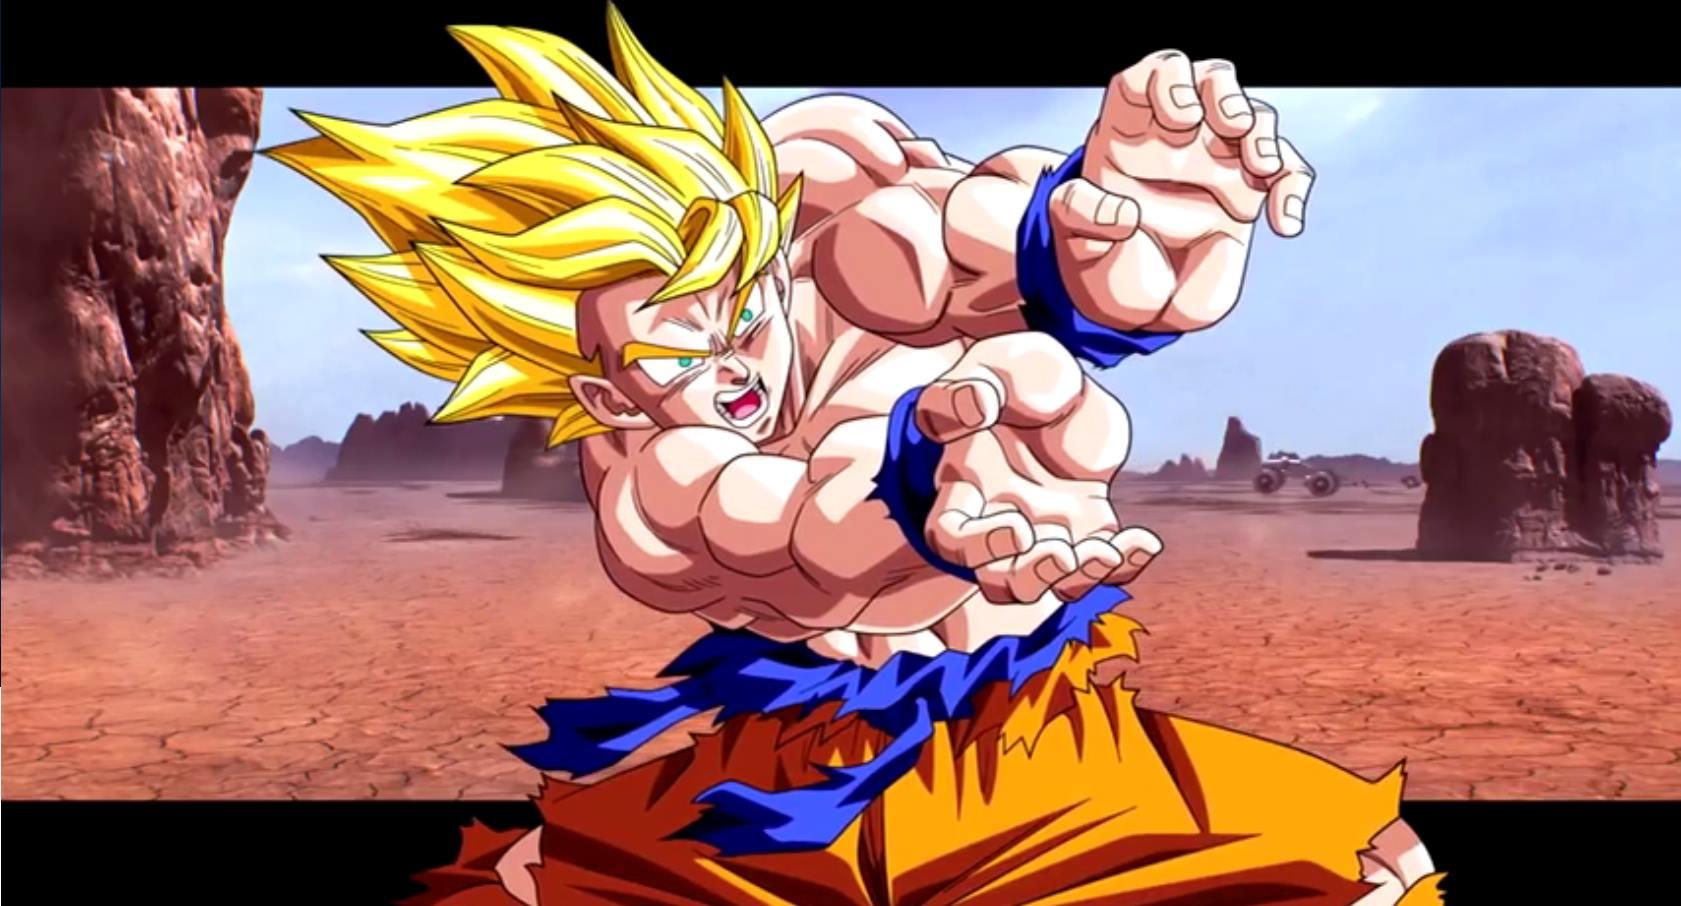 Télécharger Fonds D écran Goku Super Saiyan Gratuitement